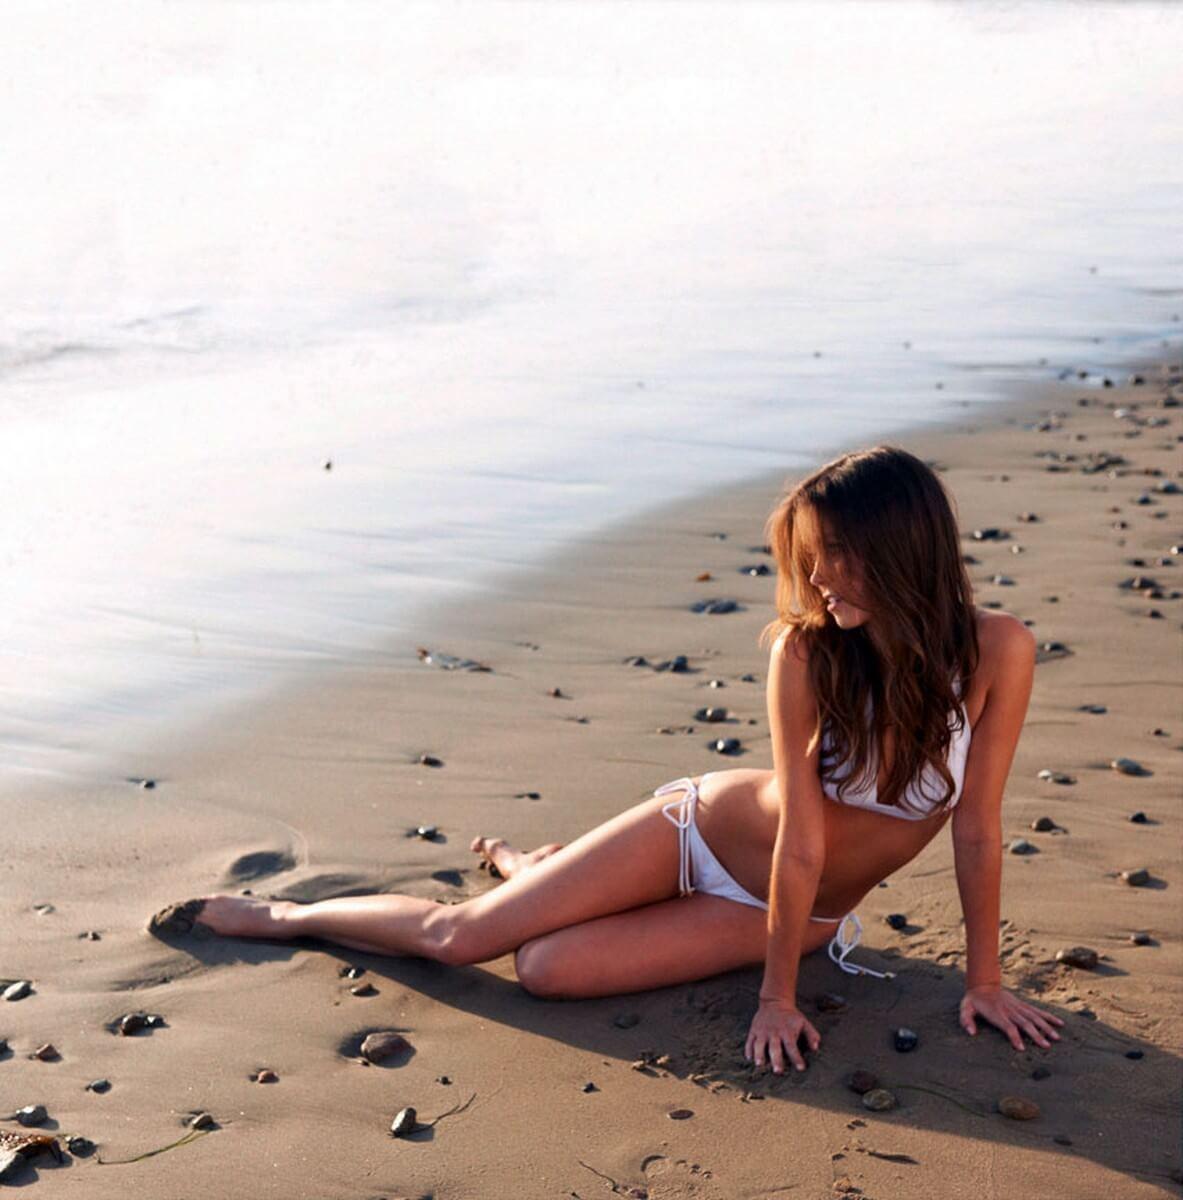 Summer Glau hot bikini pics